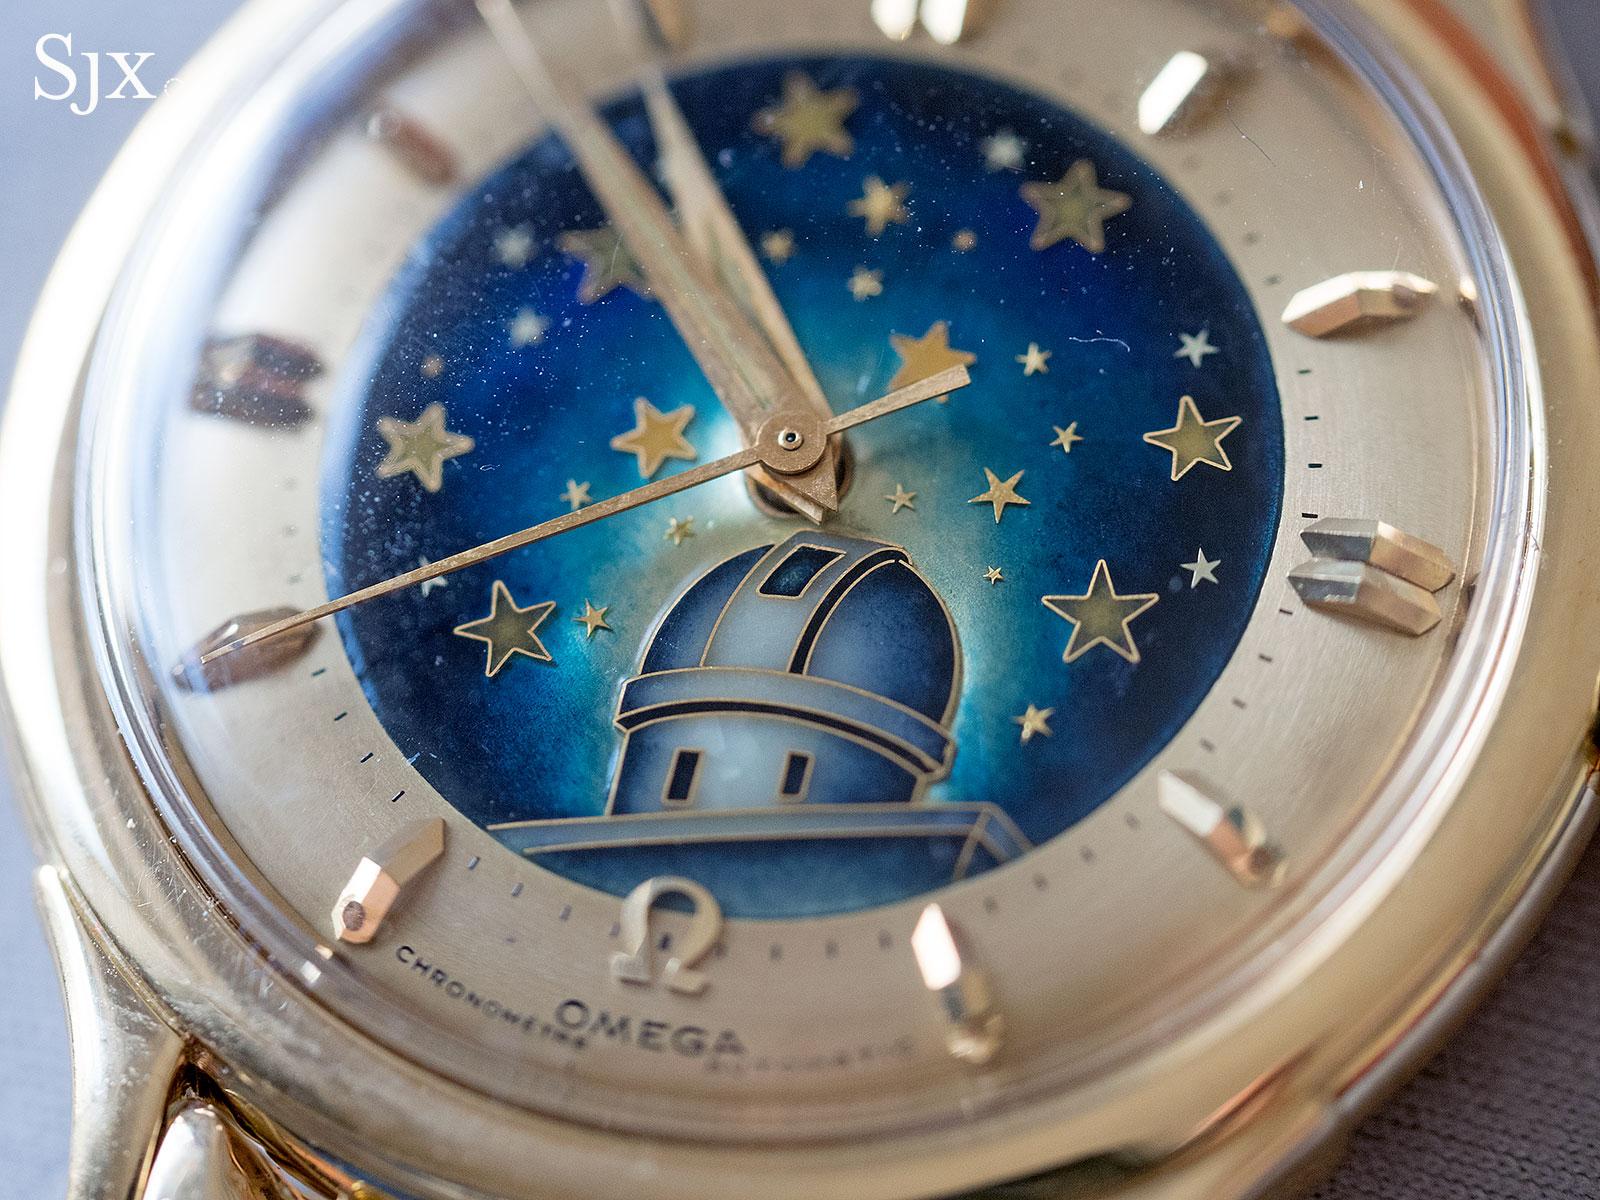 Omega Constellation De Luxe cloisonne enamel 2